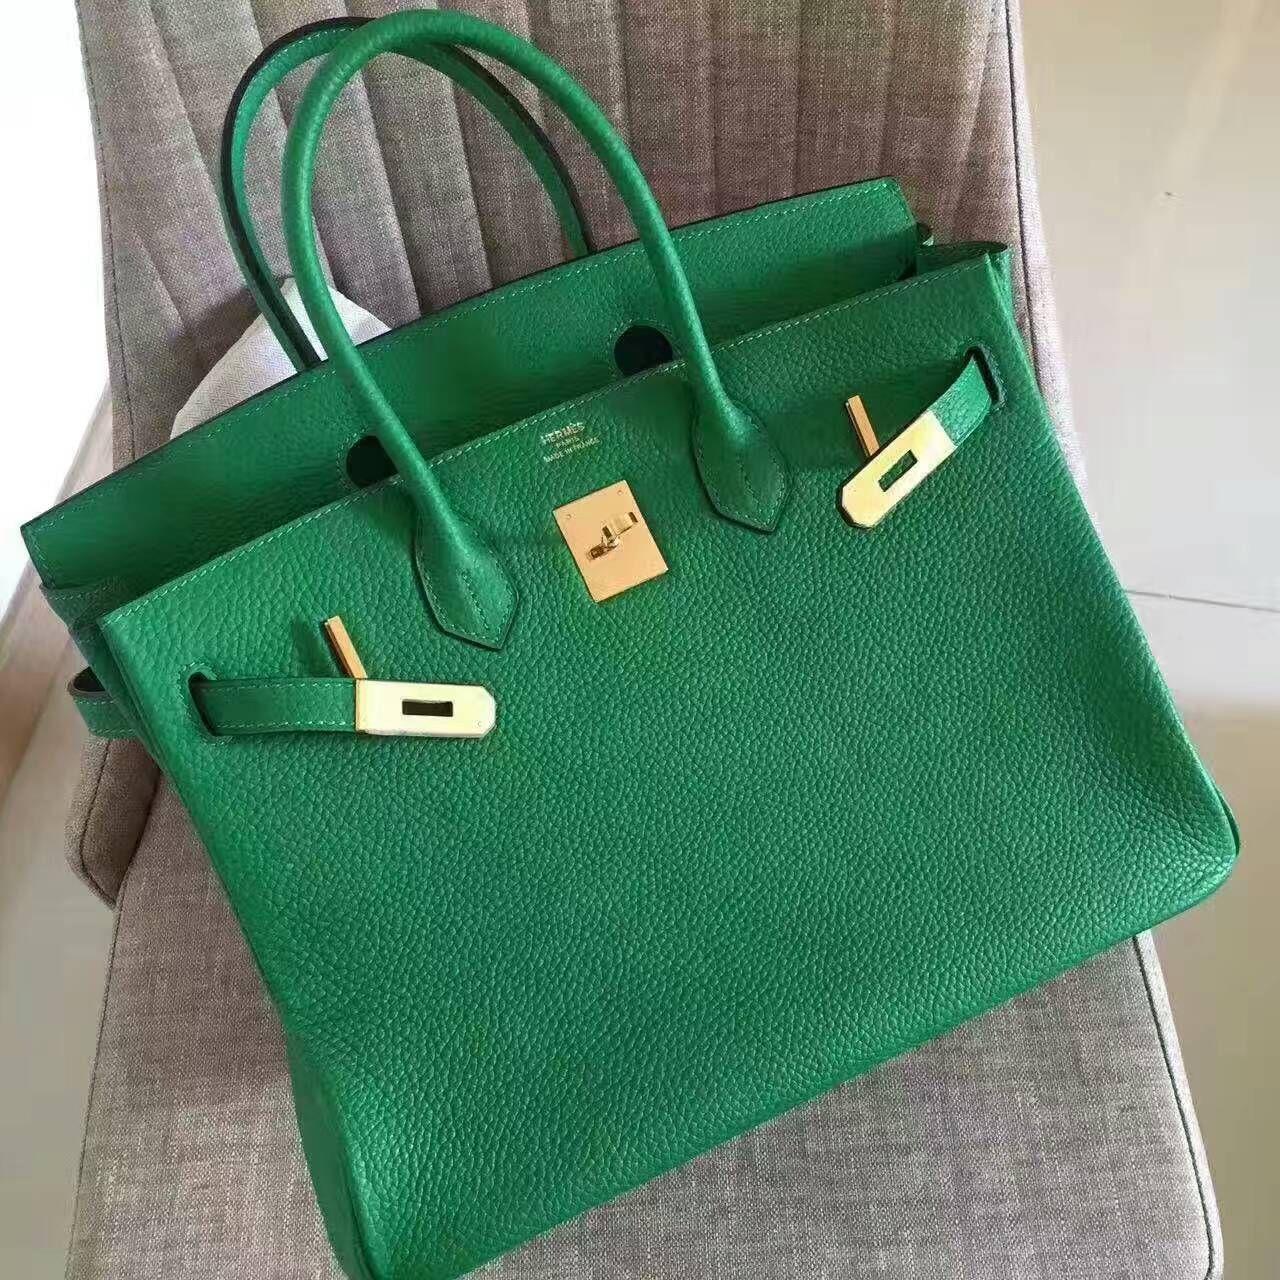 889d7221846 Hermes Birkin 35CM Original Togo Leather Handbag H1099 Bamboo Green(Gold  Hardware Size  W35 x H28 x D18cm)